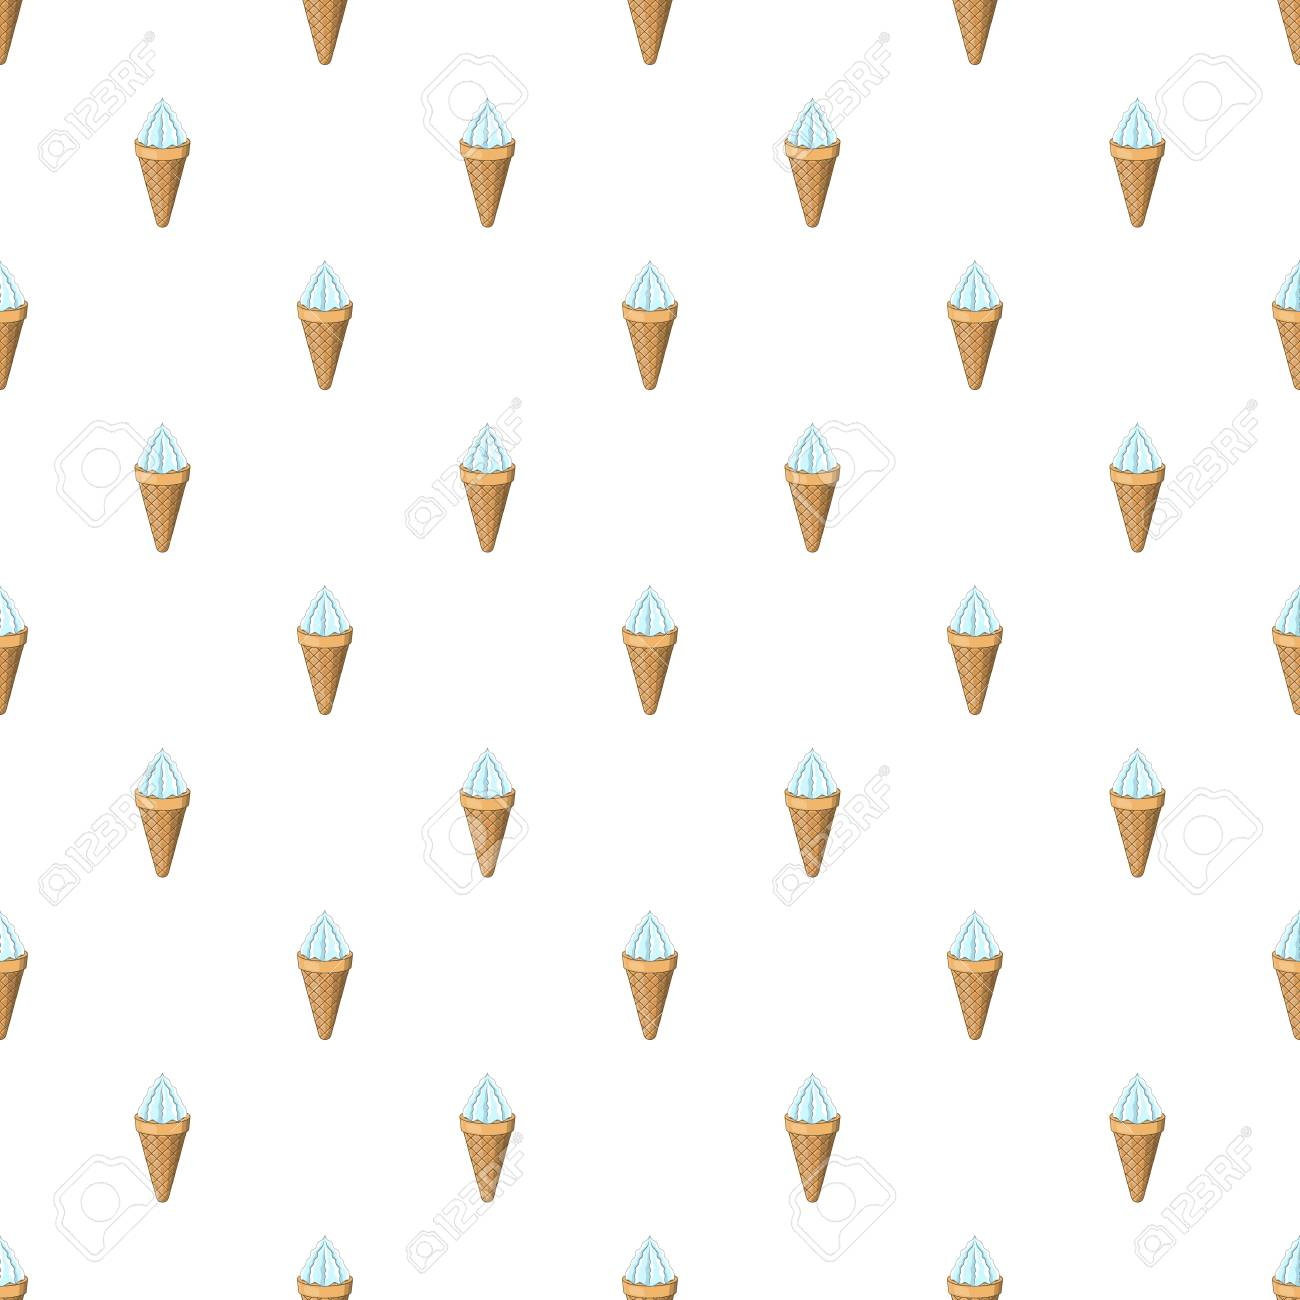 Vanilla Ice Cream In A Waffle Cone Pattern Cartoon Illustration